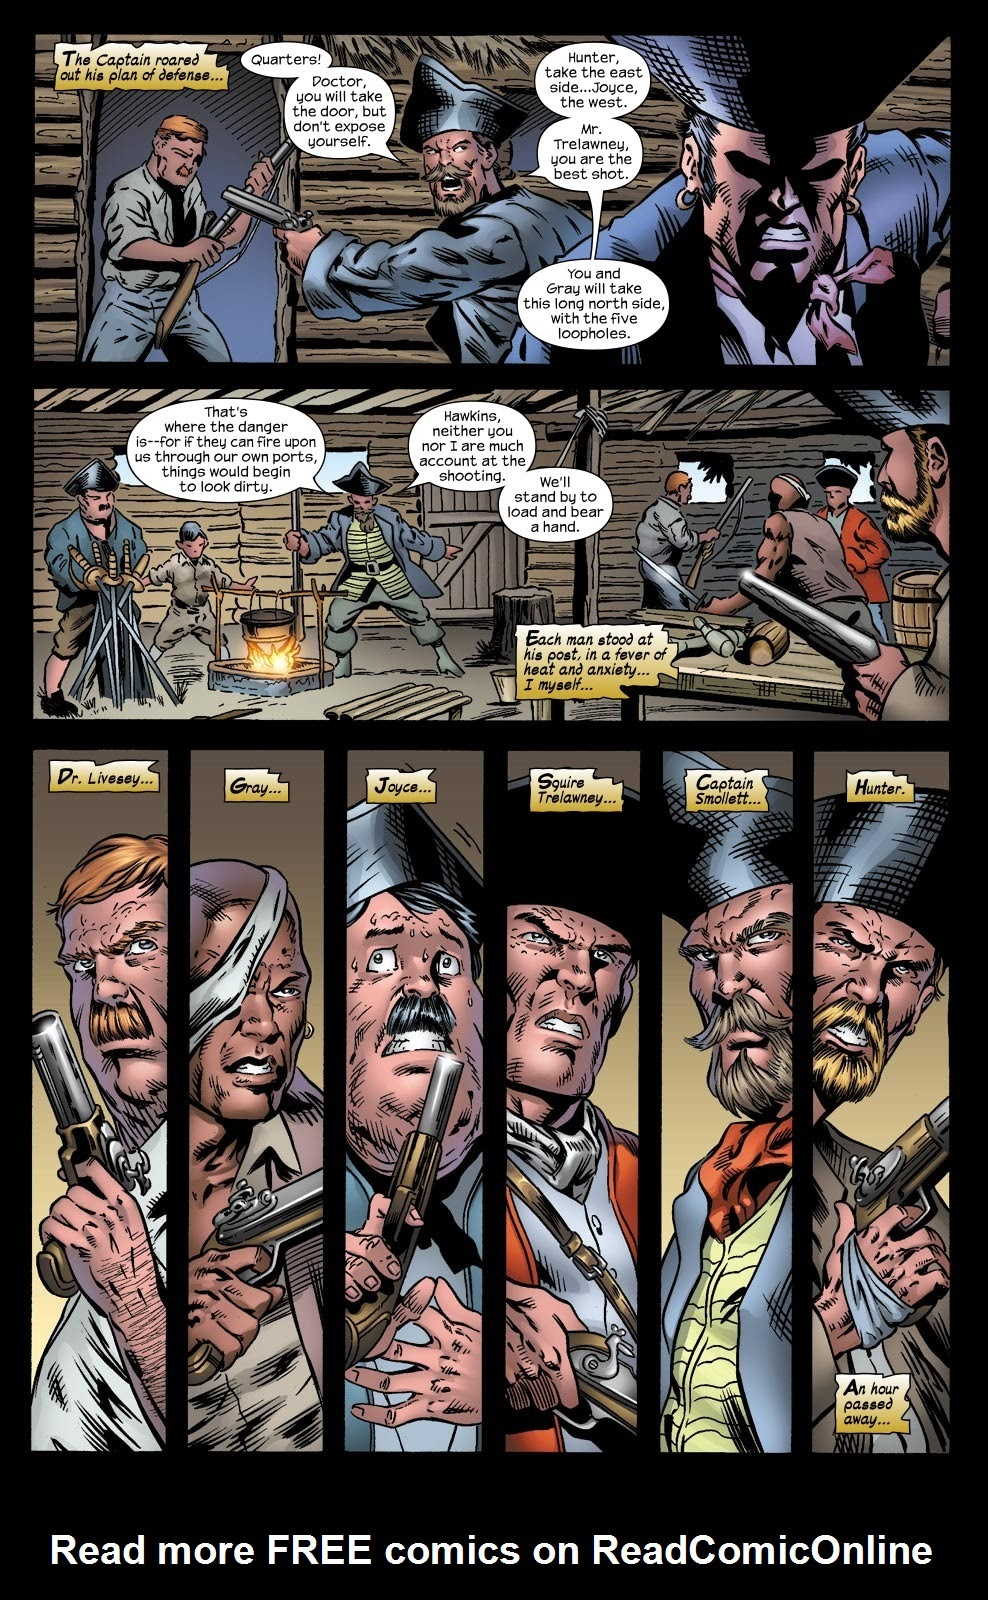 Read online Treasure Island comic -  Issue #4 - 7